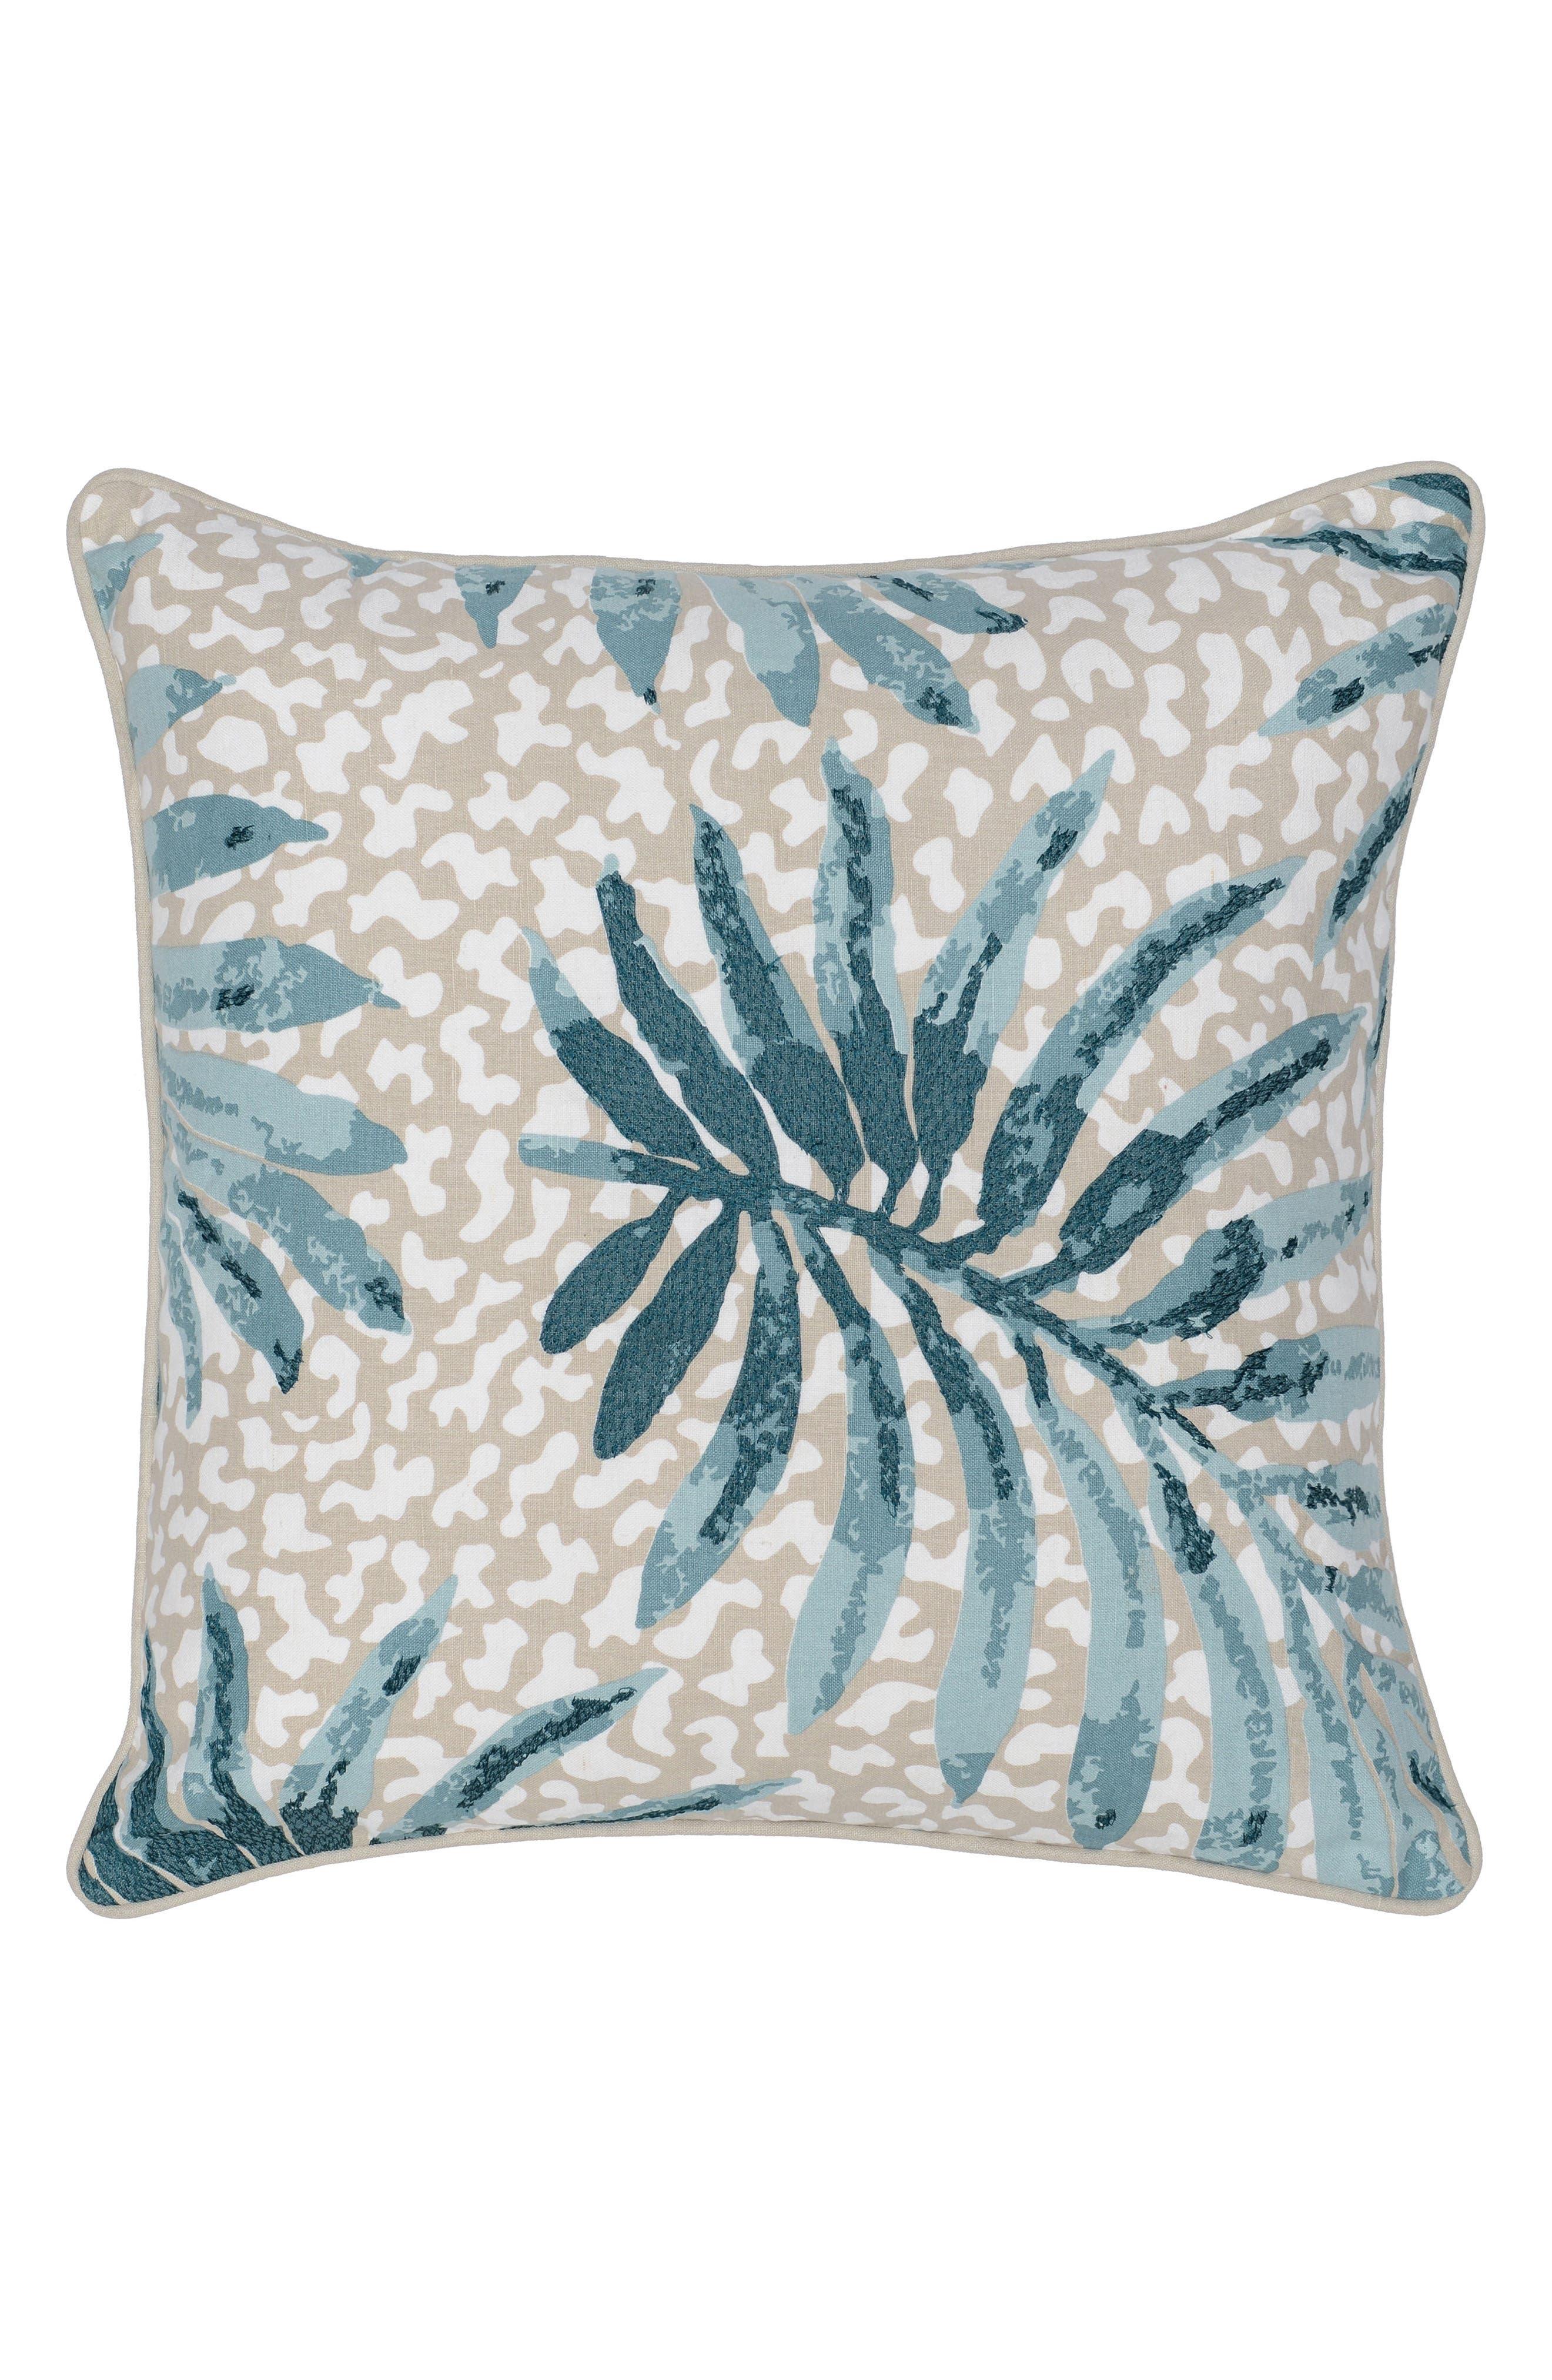 Cobi Pillow,                         Main,                         color, Beige/ Teal